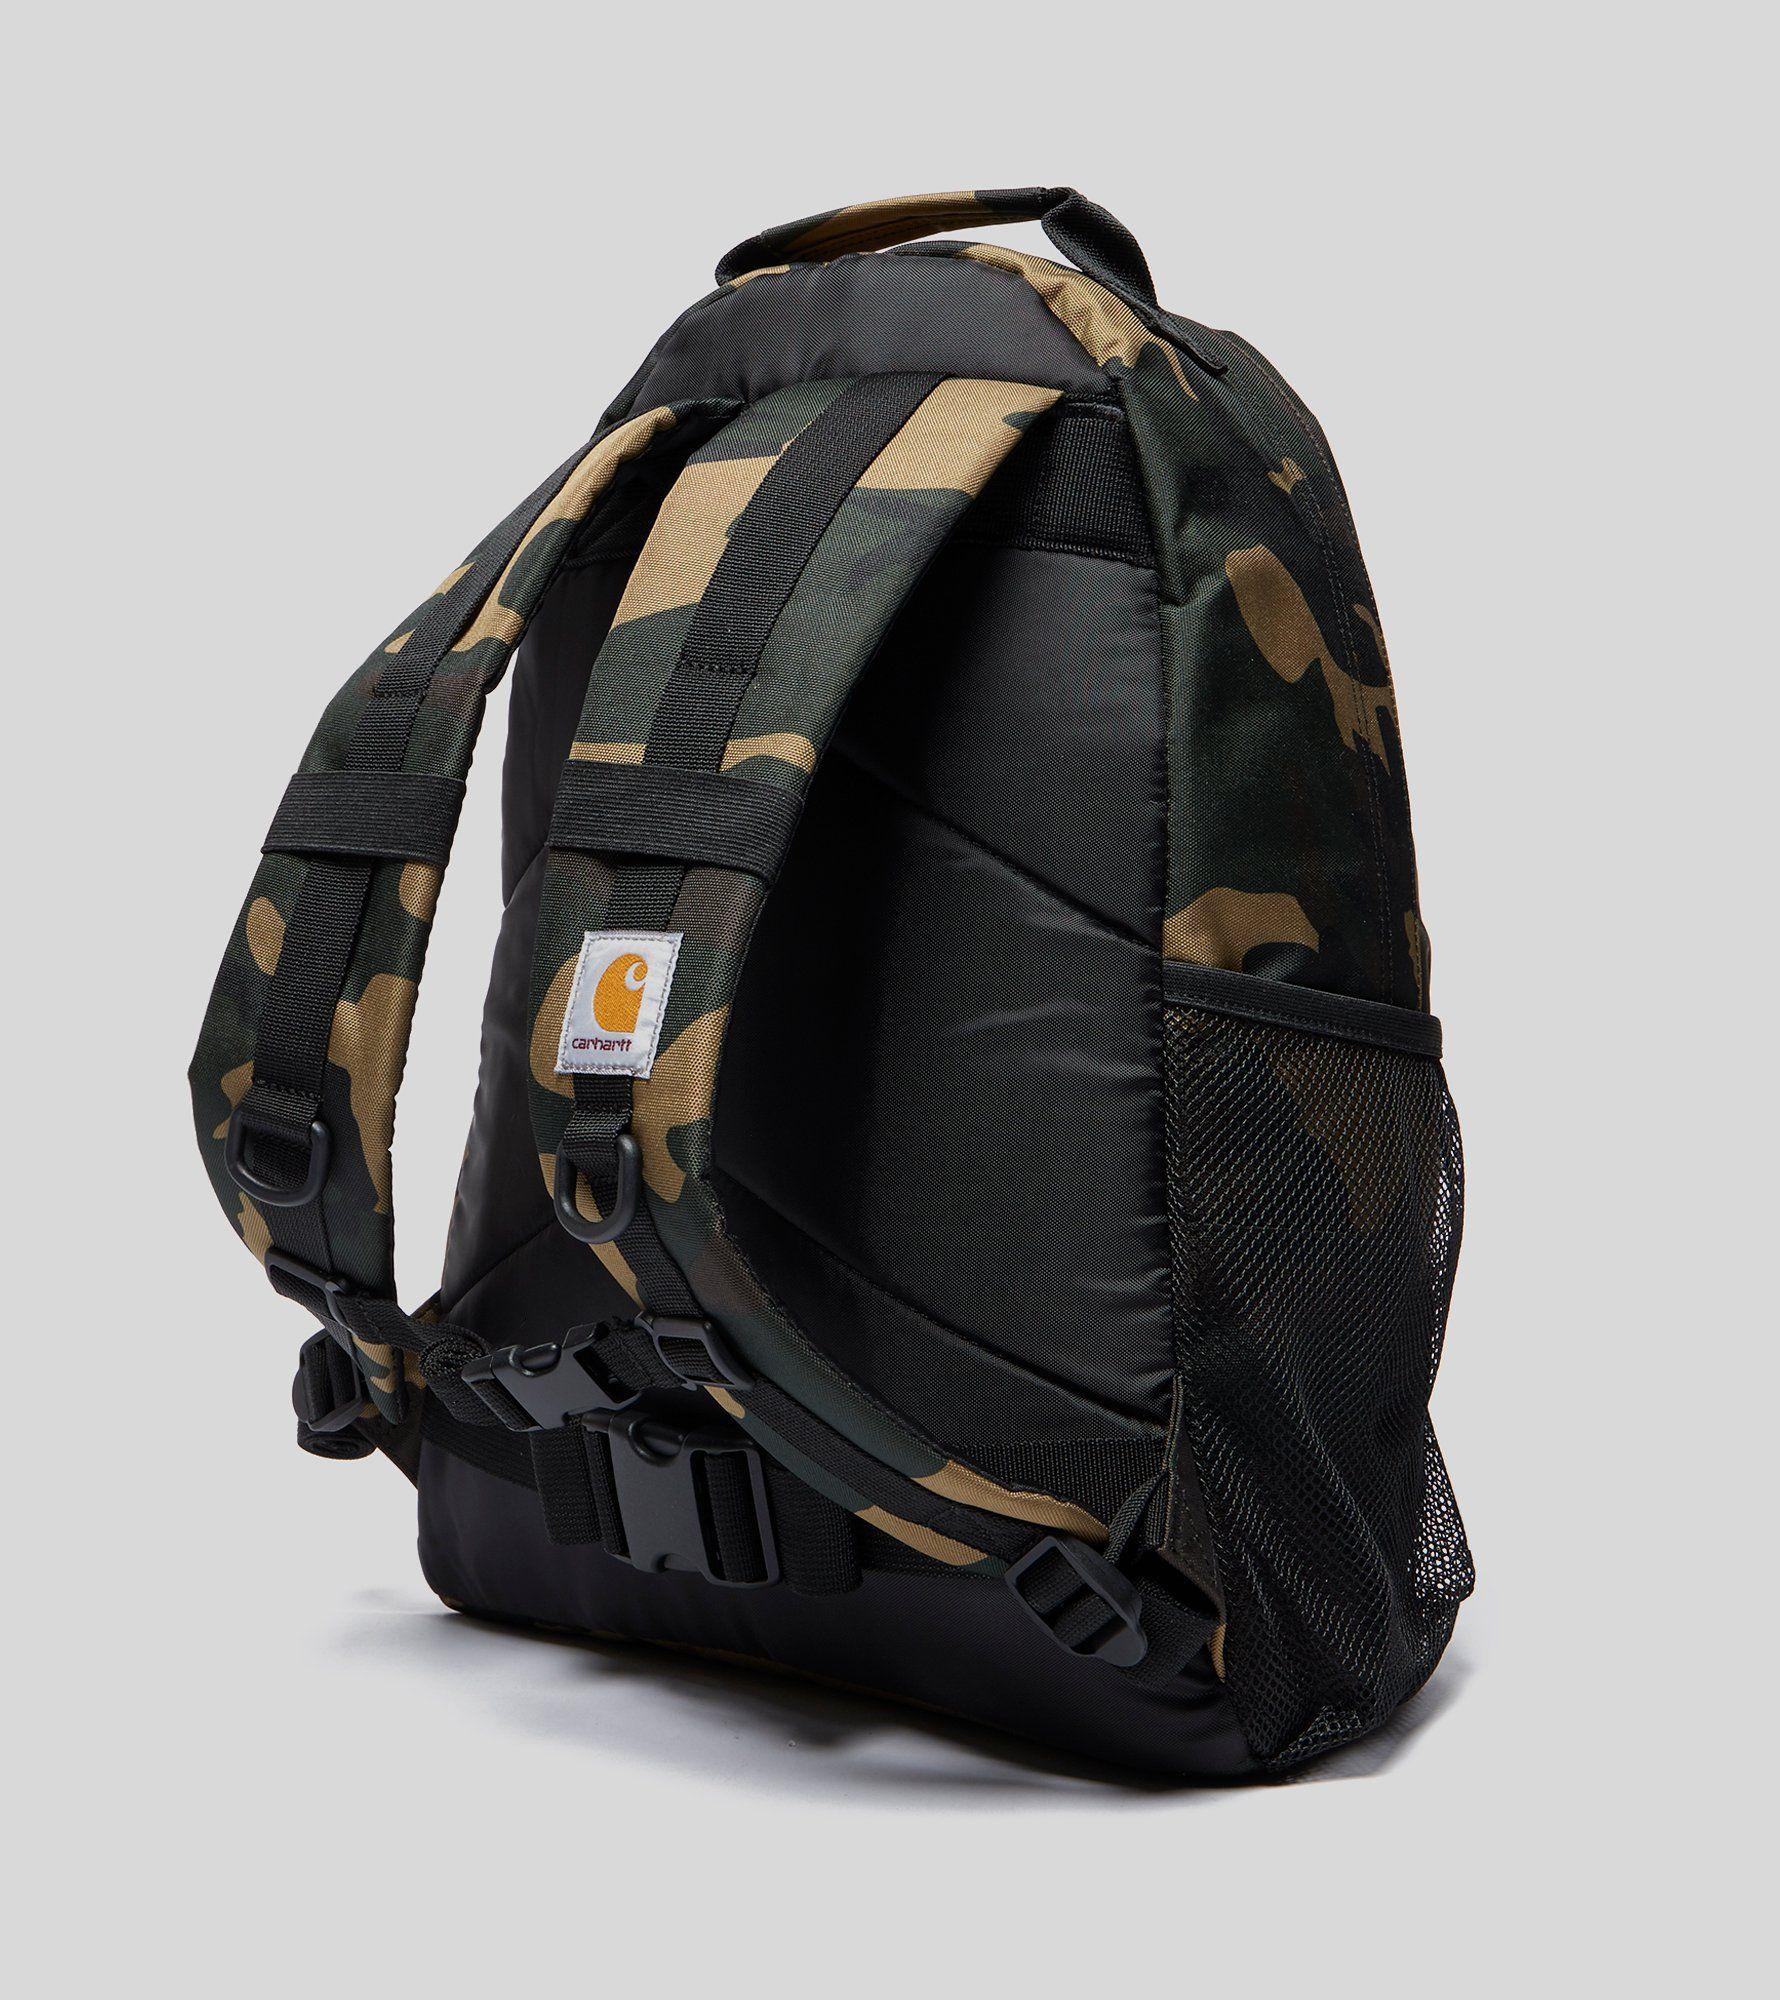 Carhartt WIP Kickflip Backpack